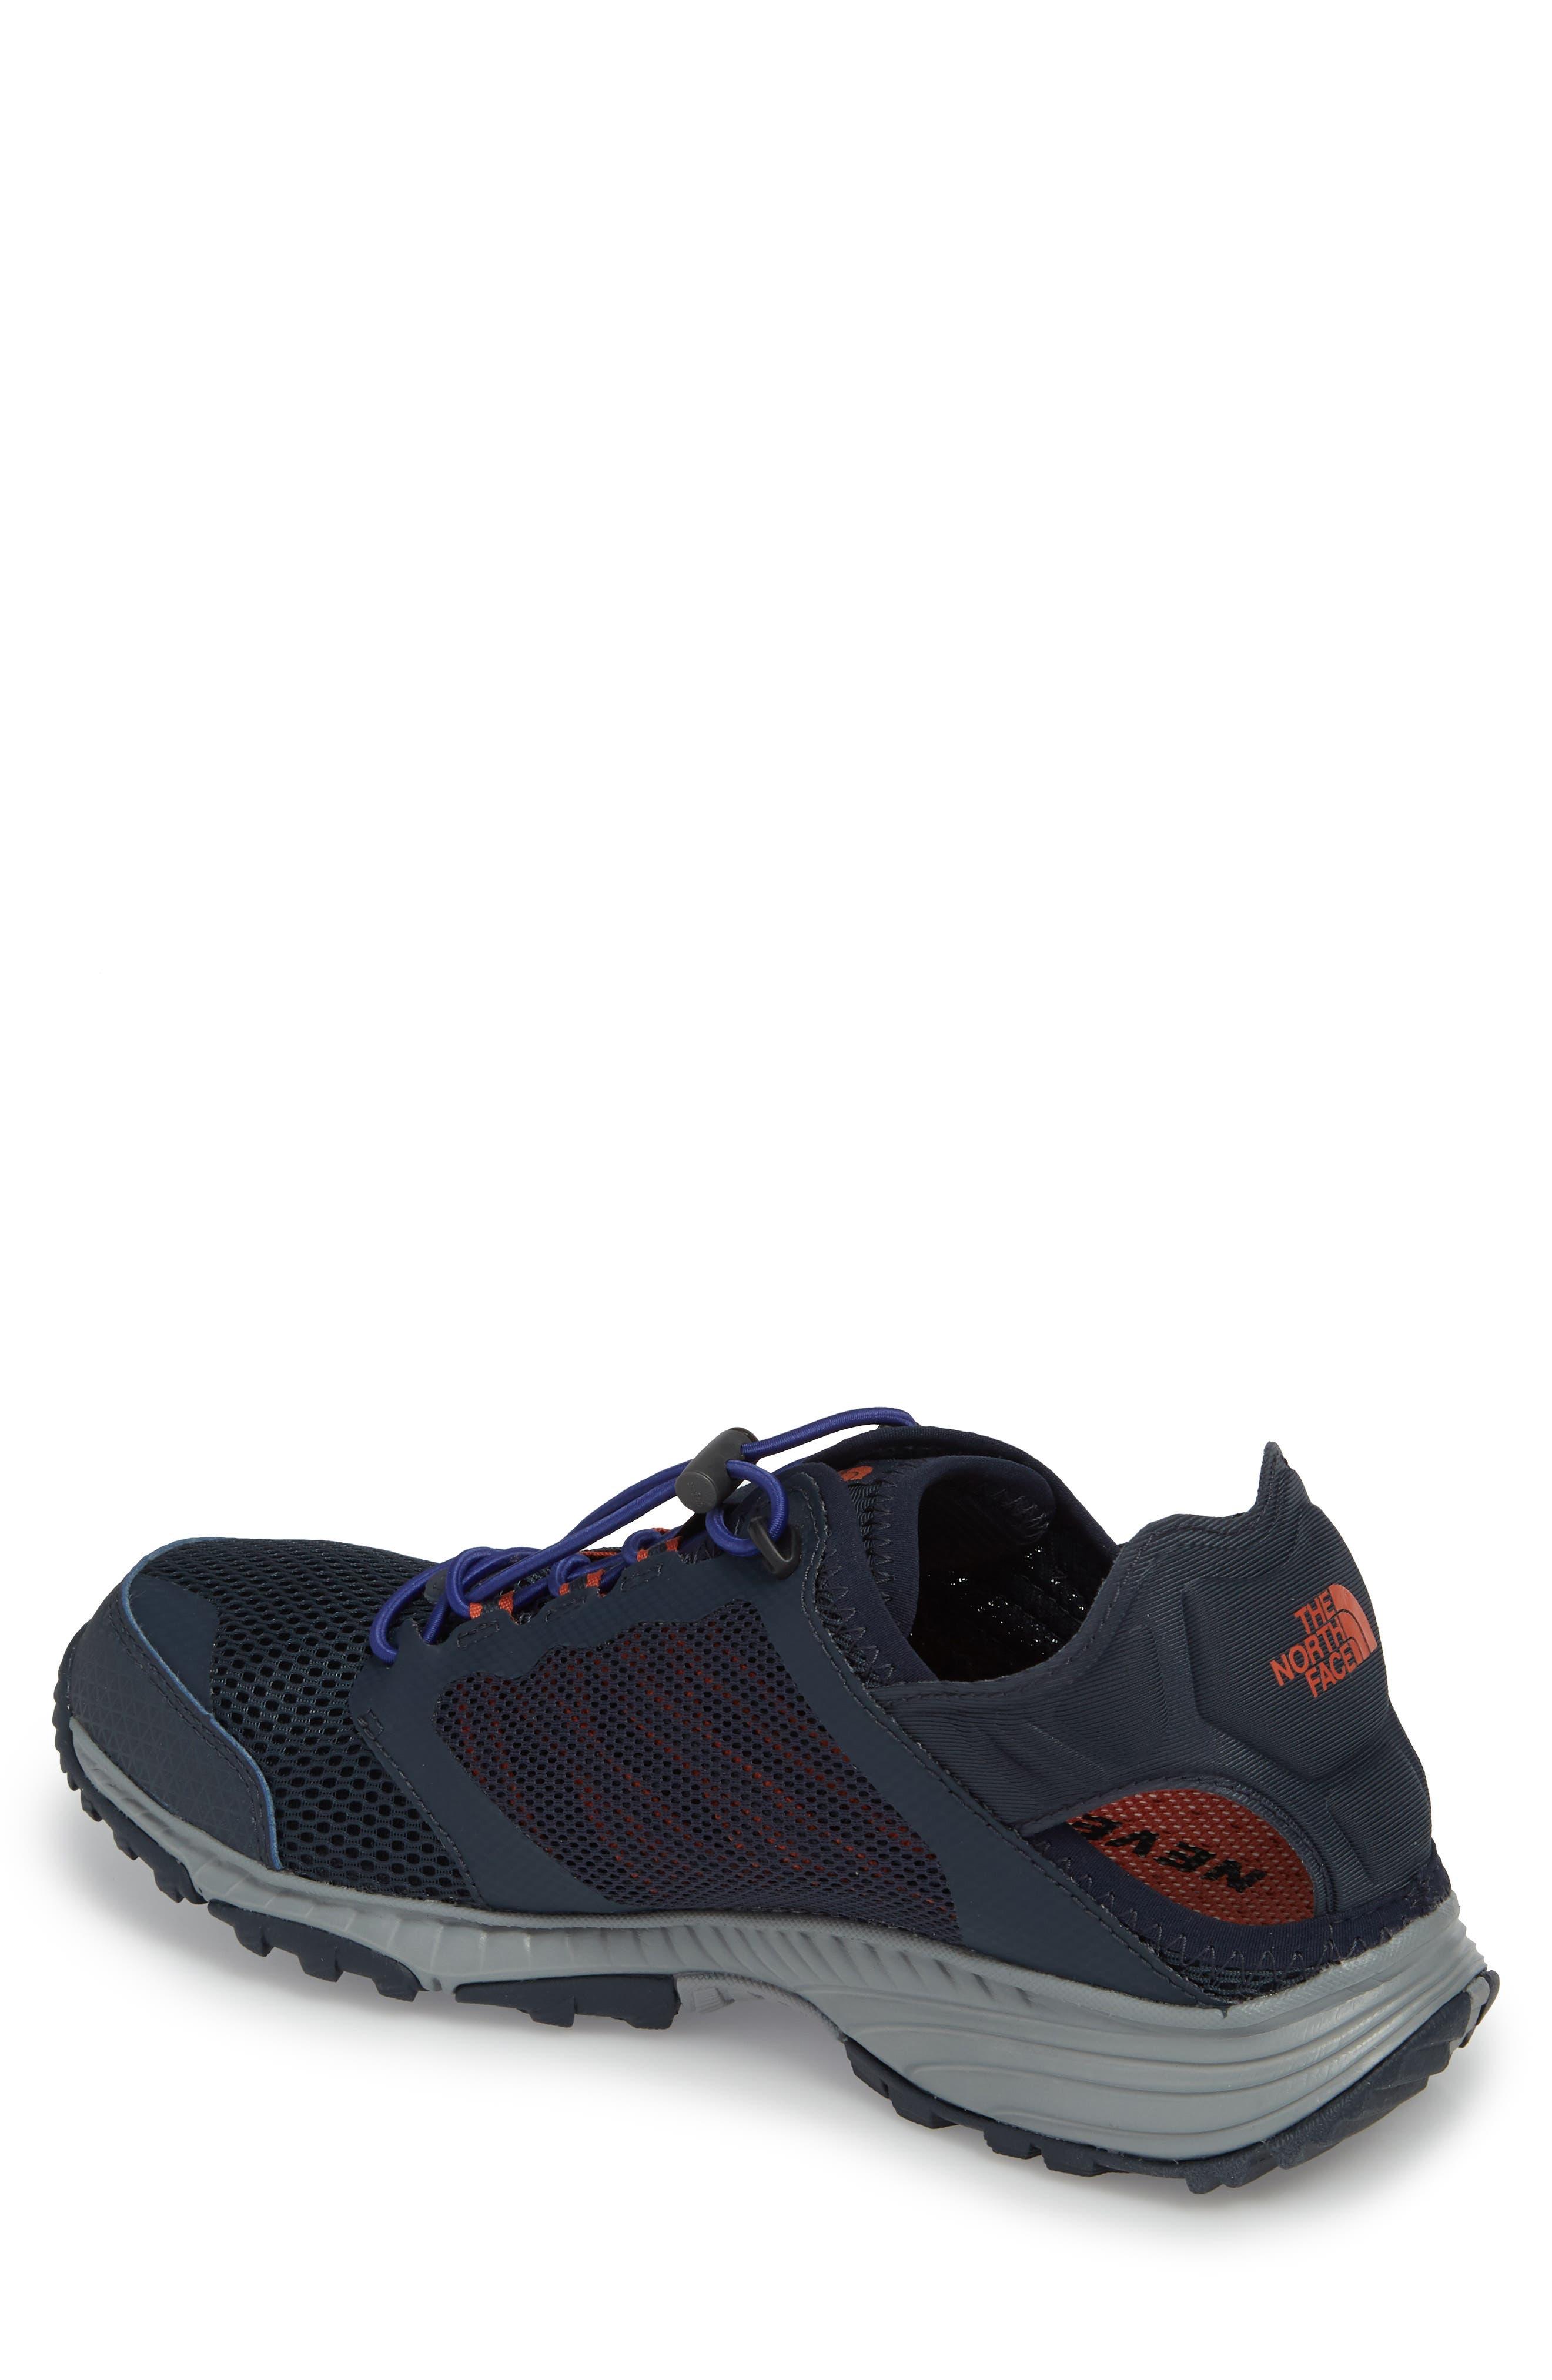 Litewave Amphibious II Collapsible Sneaker,                             Alternate thumbnail 2, color,                             400